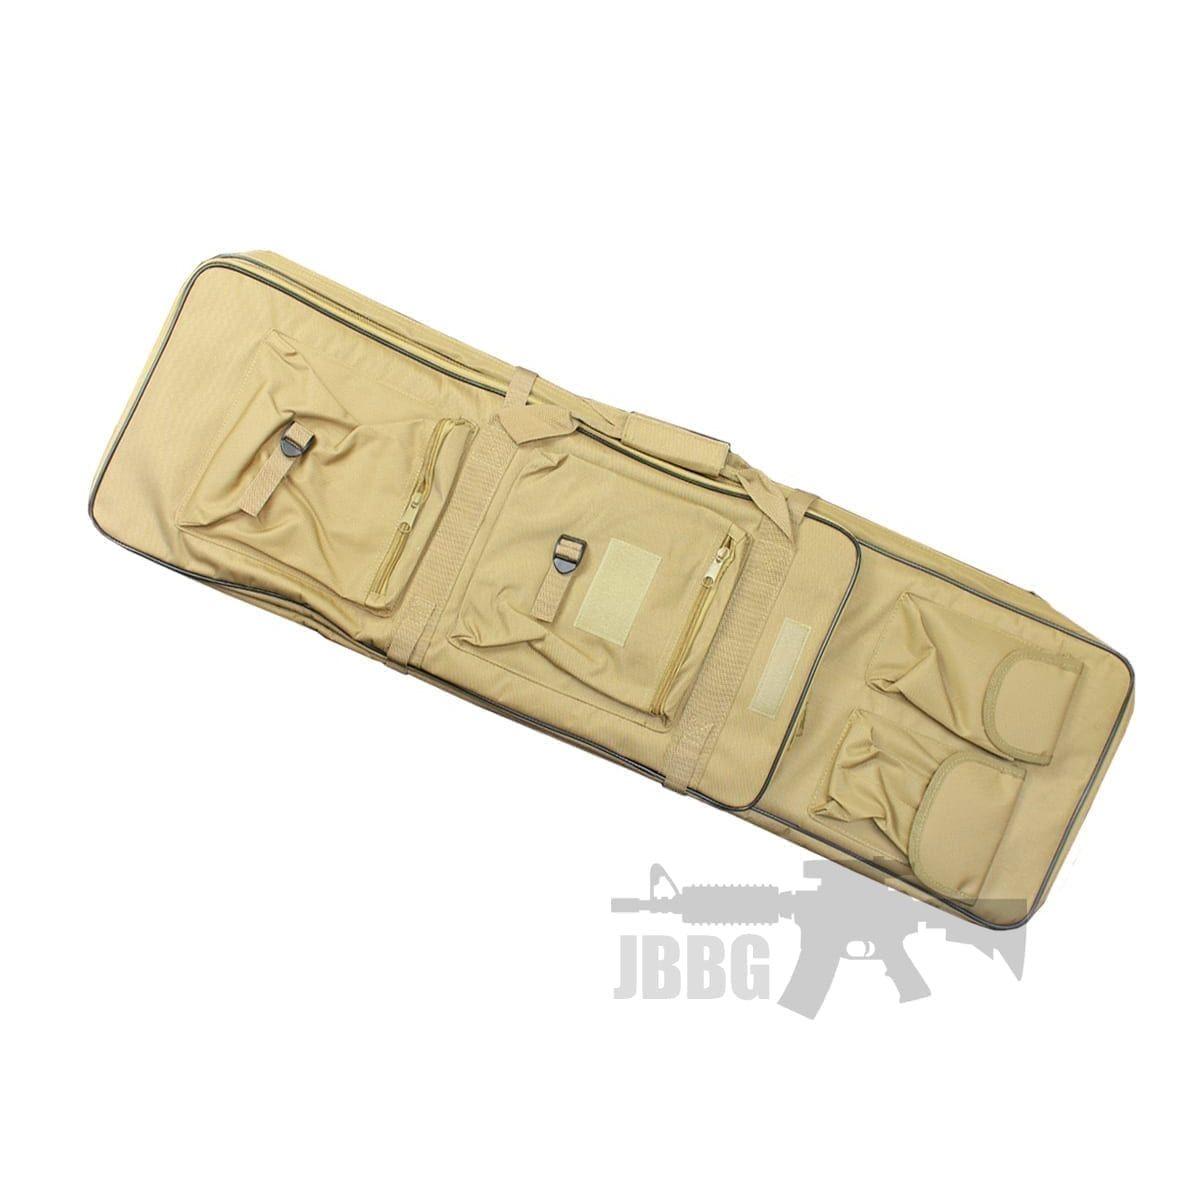 GB03 PORTABLE CARRY BAG (100CM) TAN rifle pistol pockets